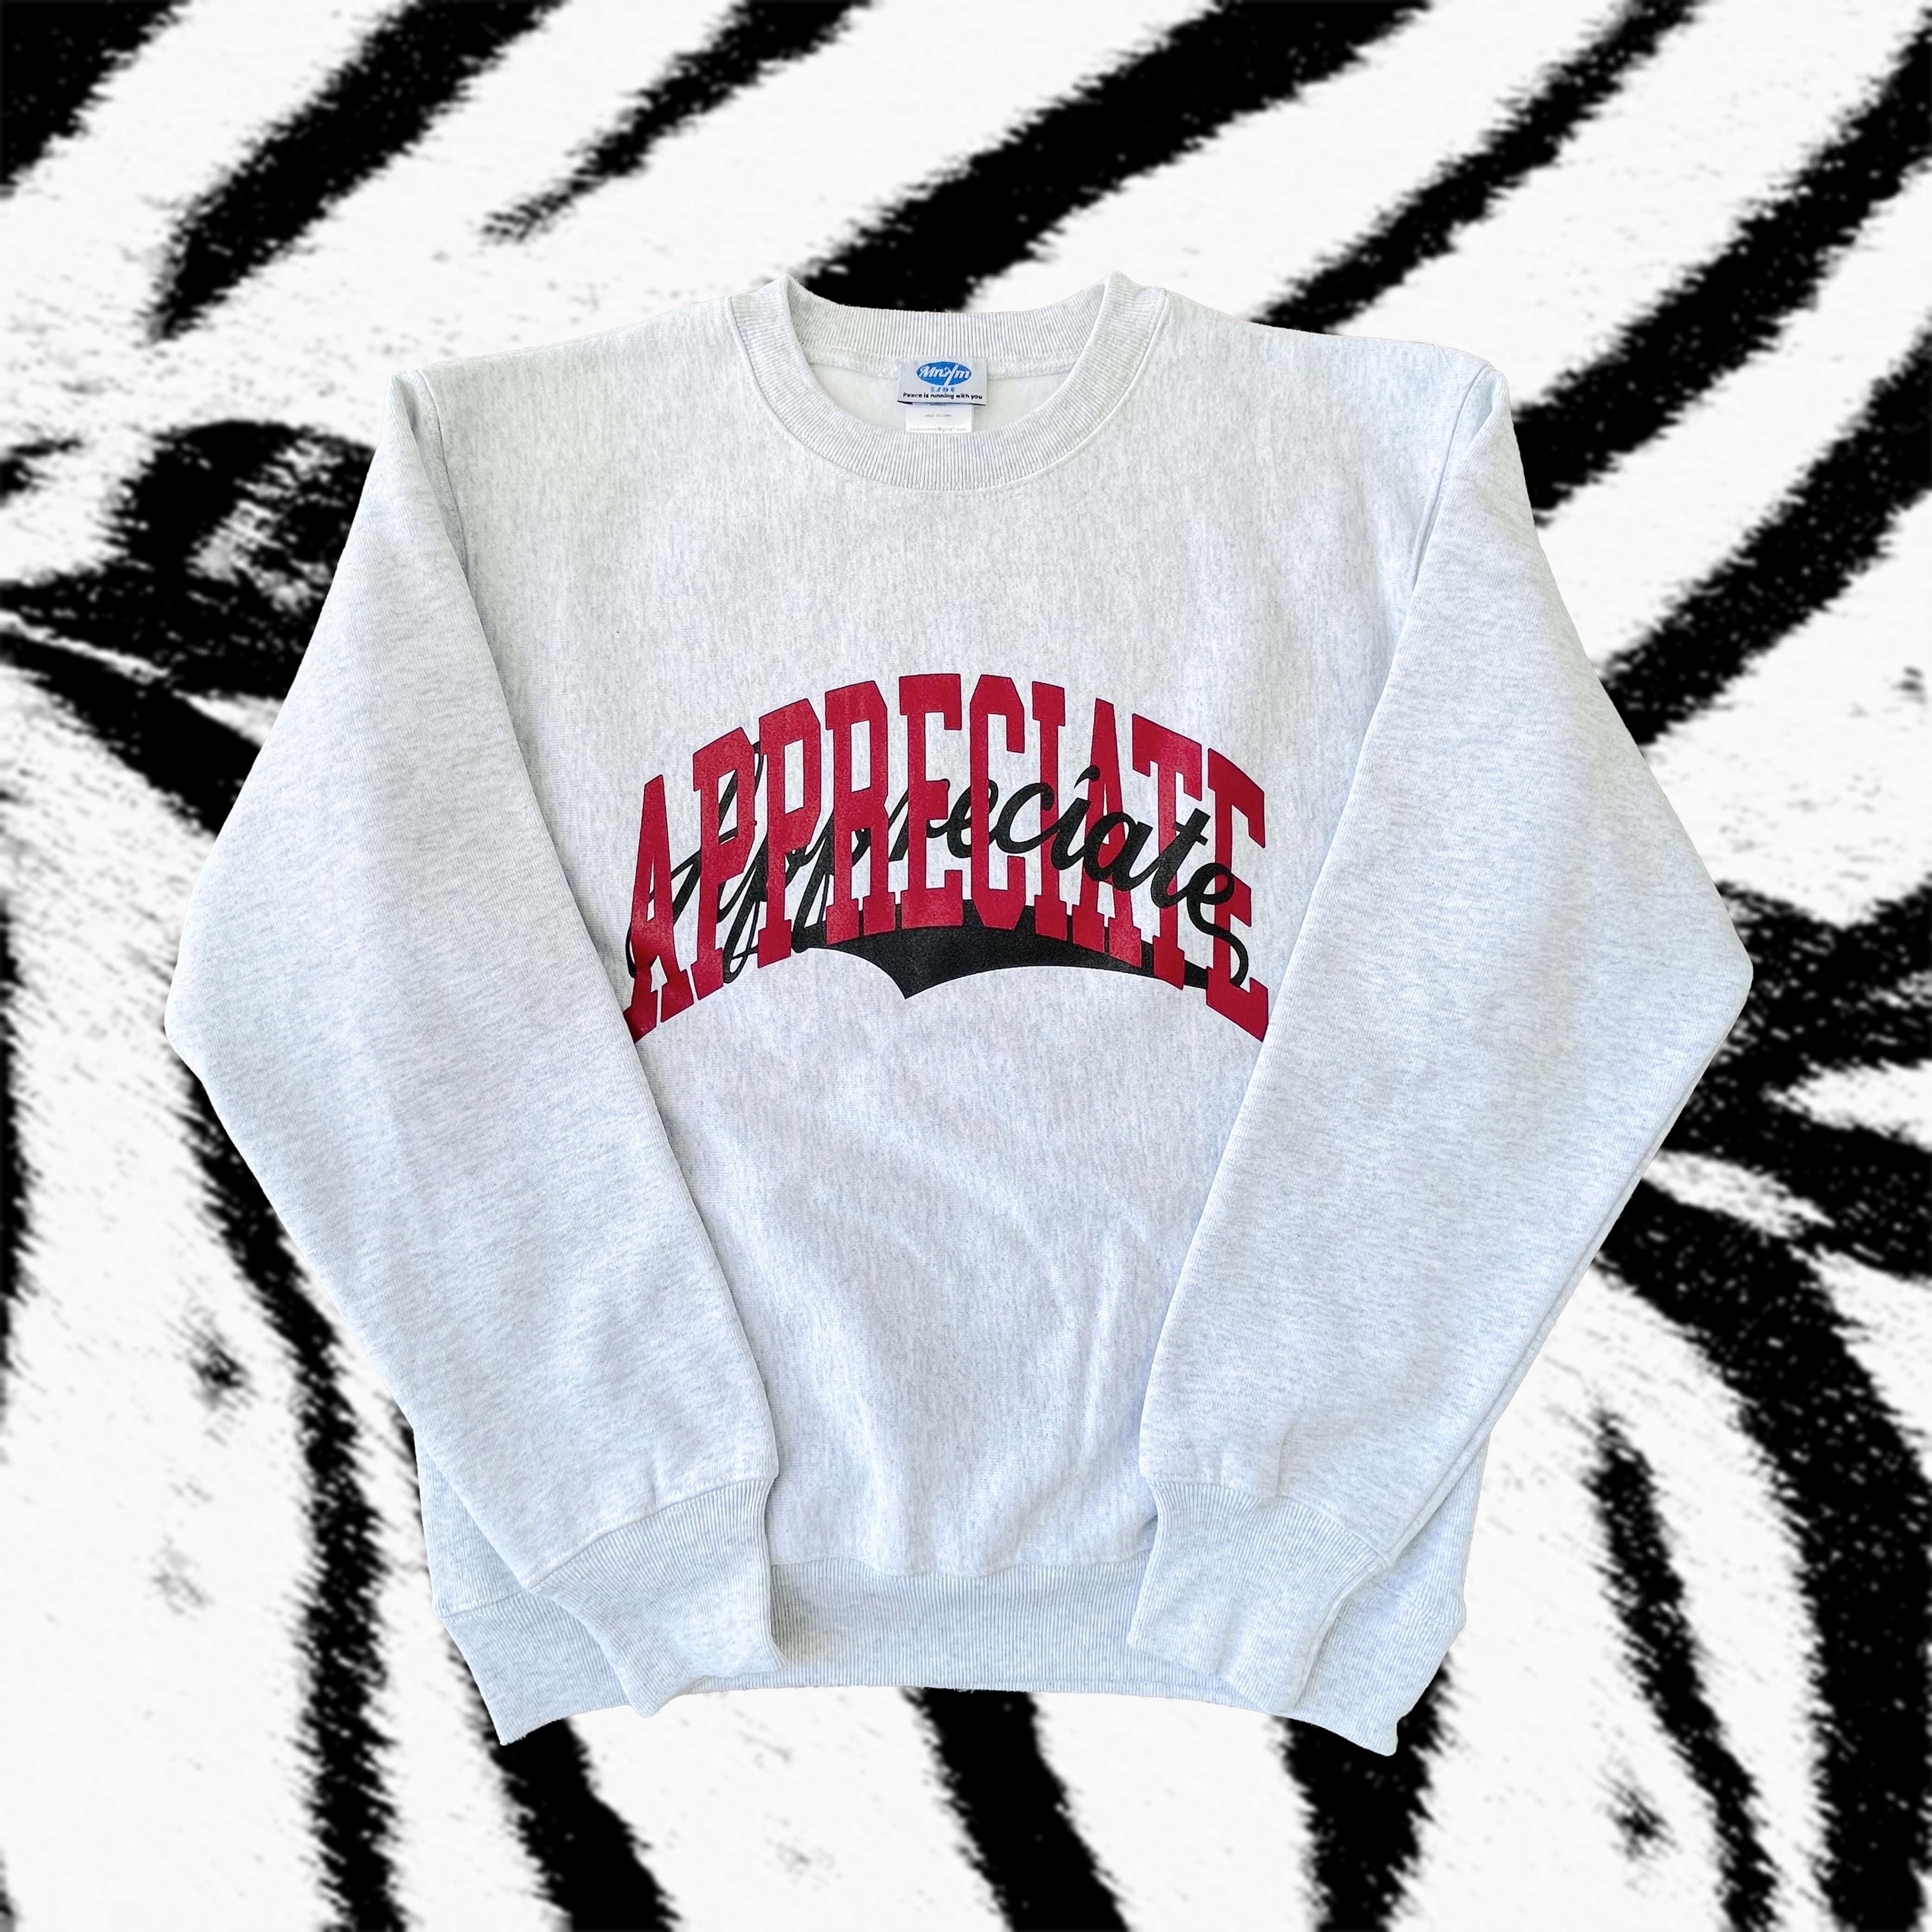 【UNISEX】APPRECIATE Sweatshirt 12.0 oz